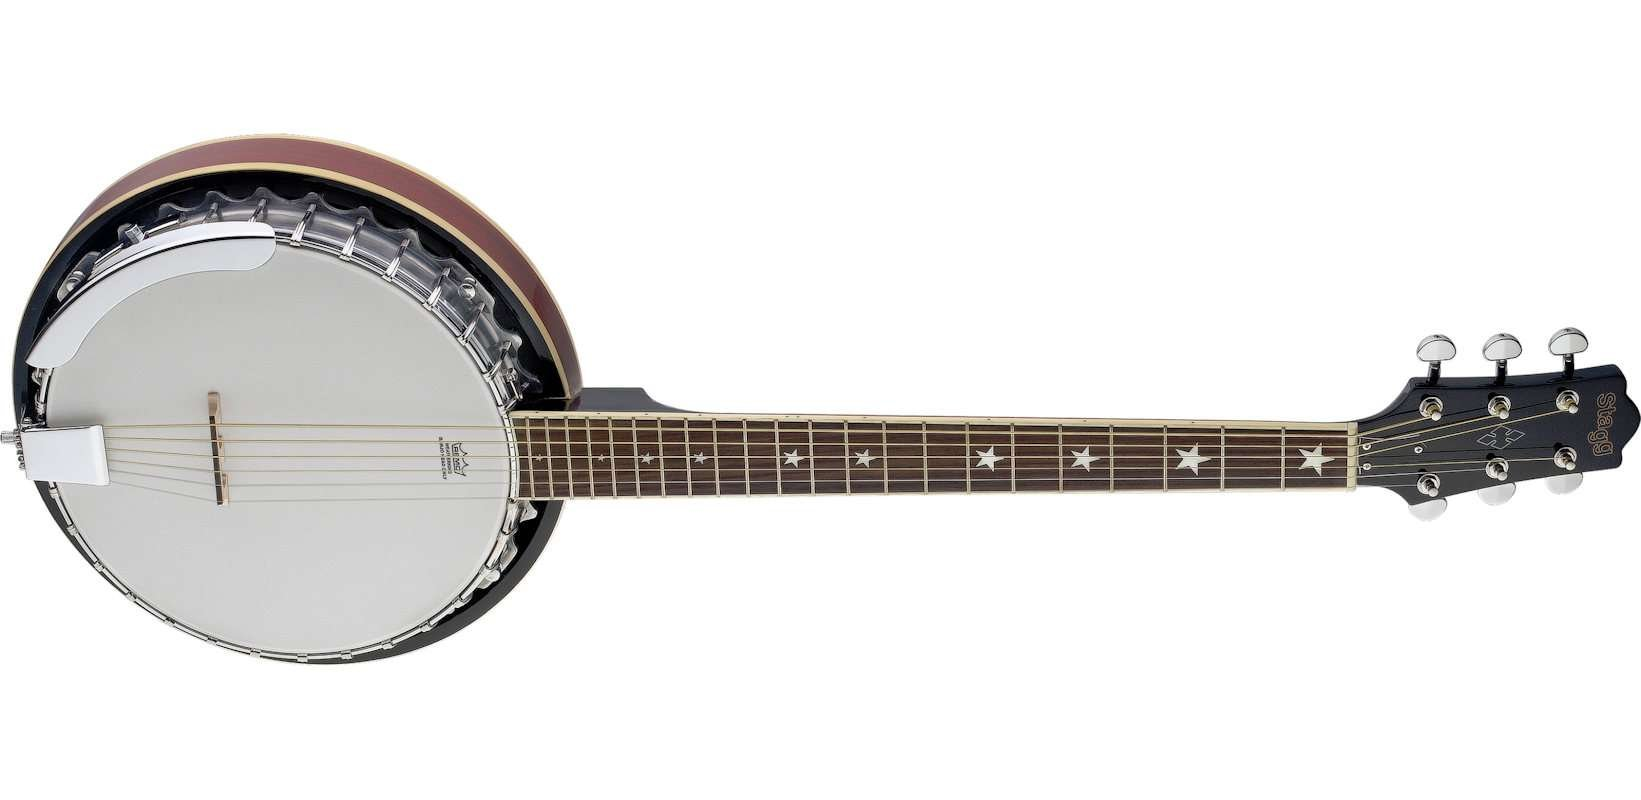 Stagg BJM30 6 String Banjo